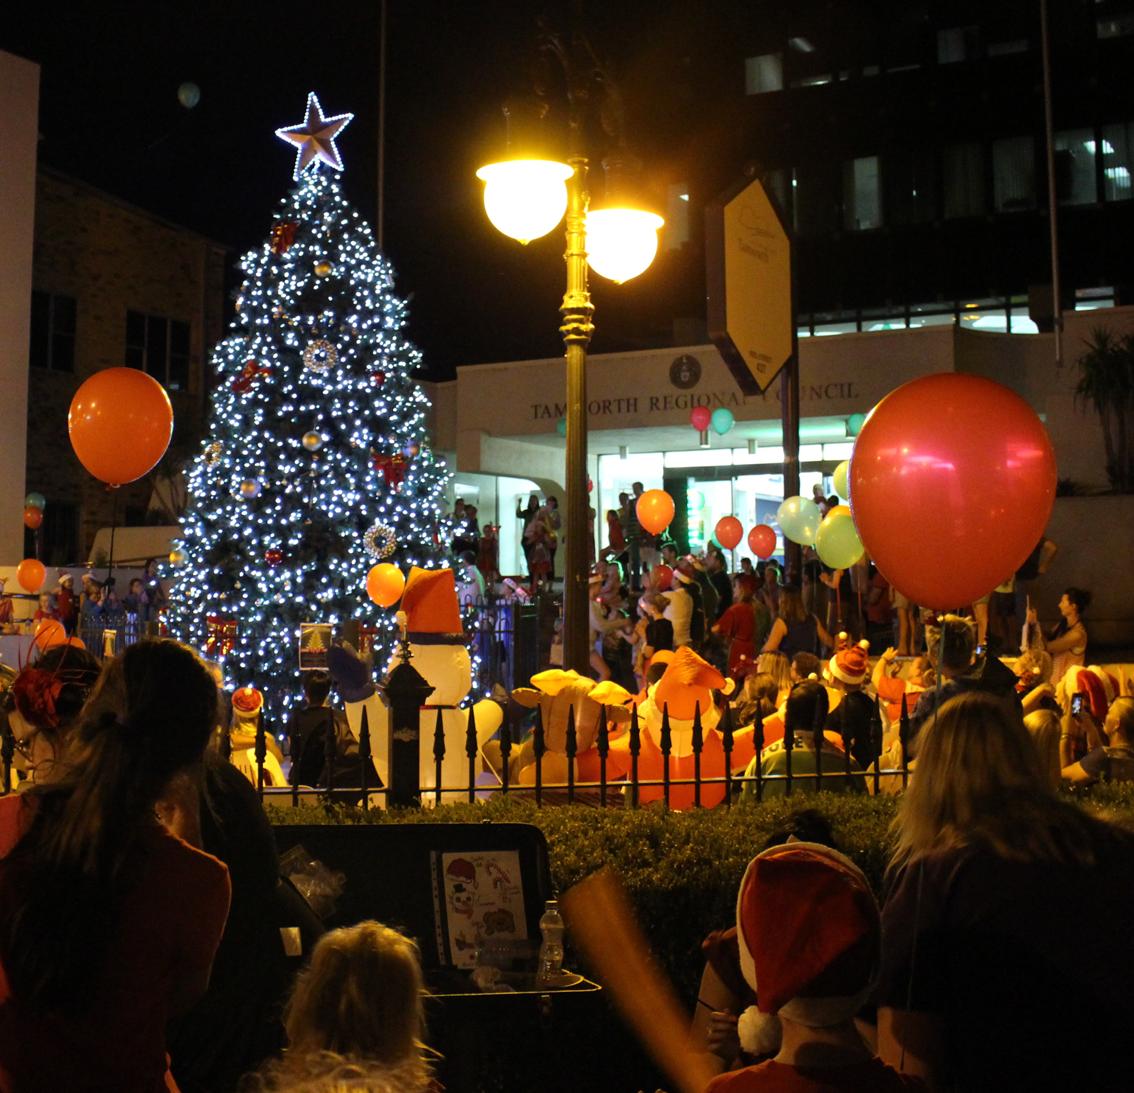 Tamworth's community Christmas tree lights up.